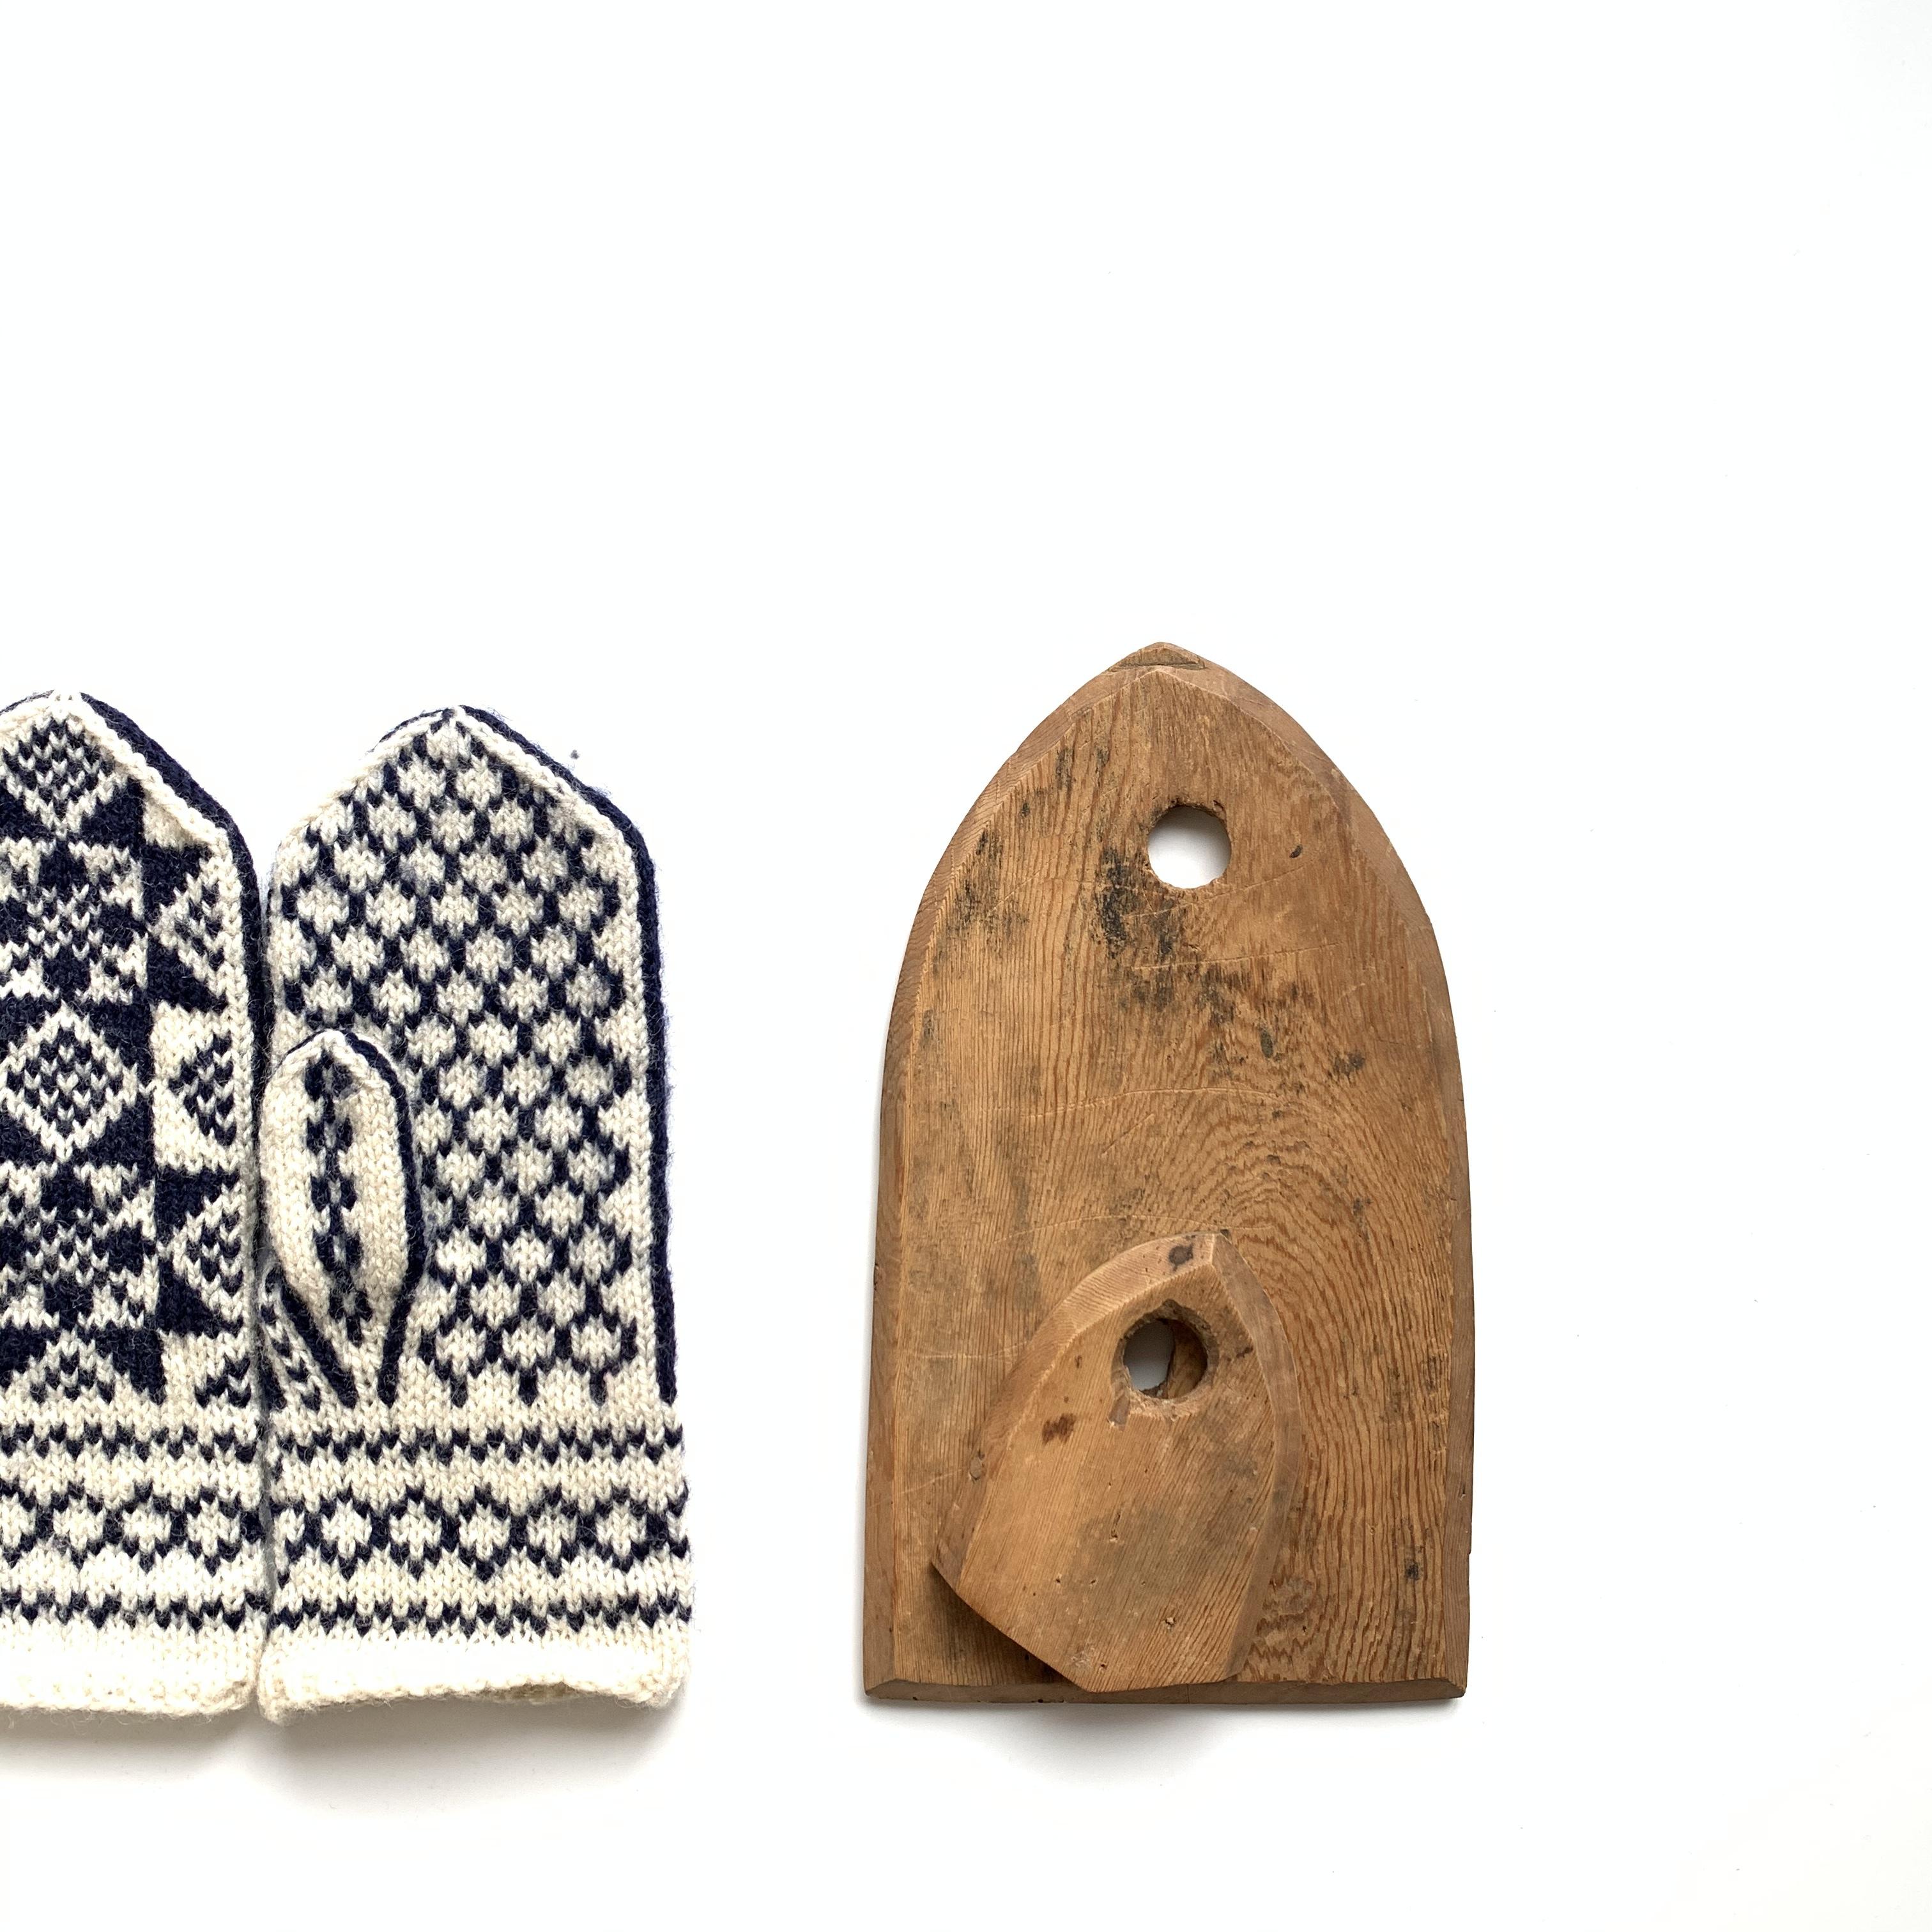 Wooden Mitten Blocker